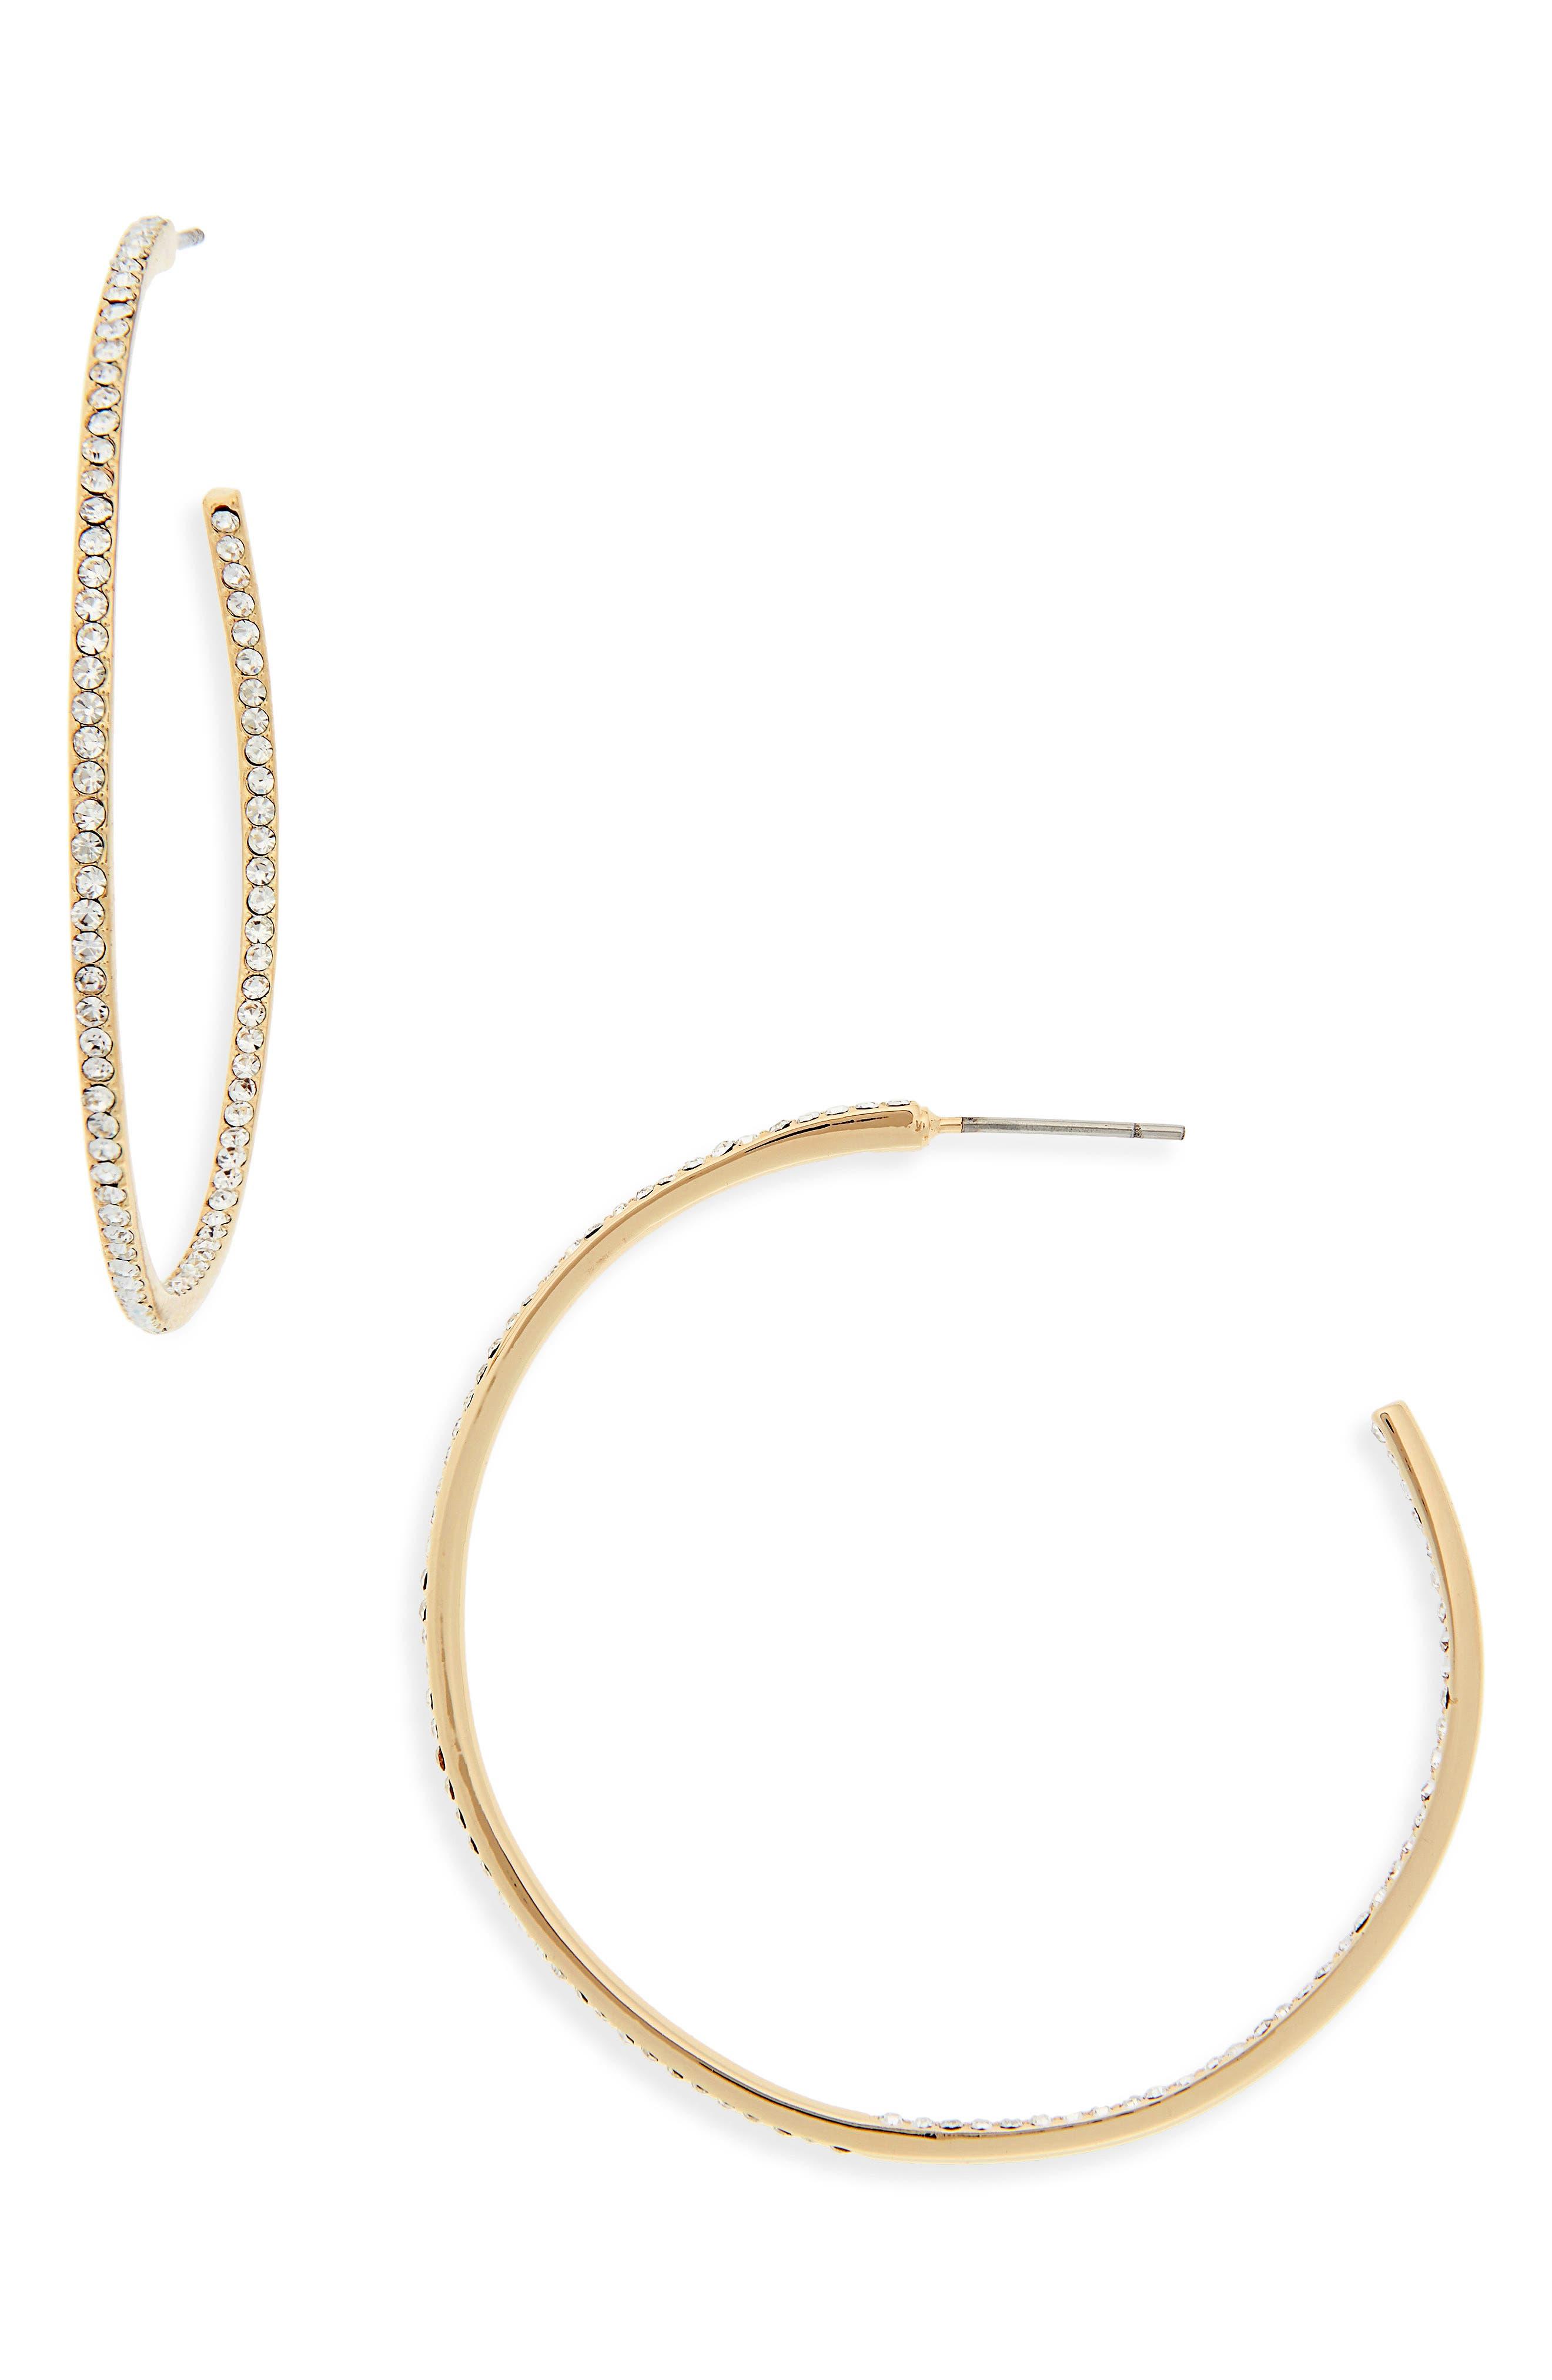 NORDSTROM Medium Seamless Pavé Hoop Earrings, Main, color, CLEAR- GOLD